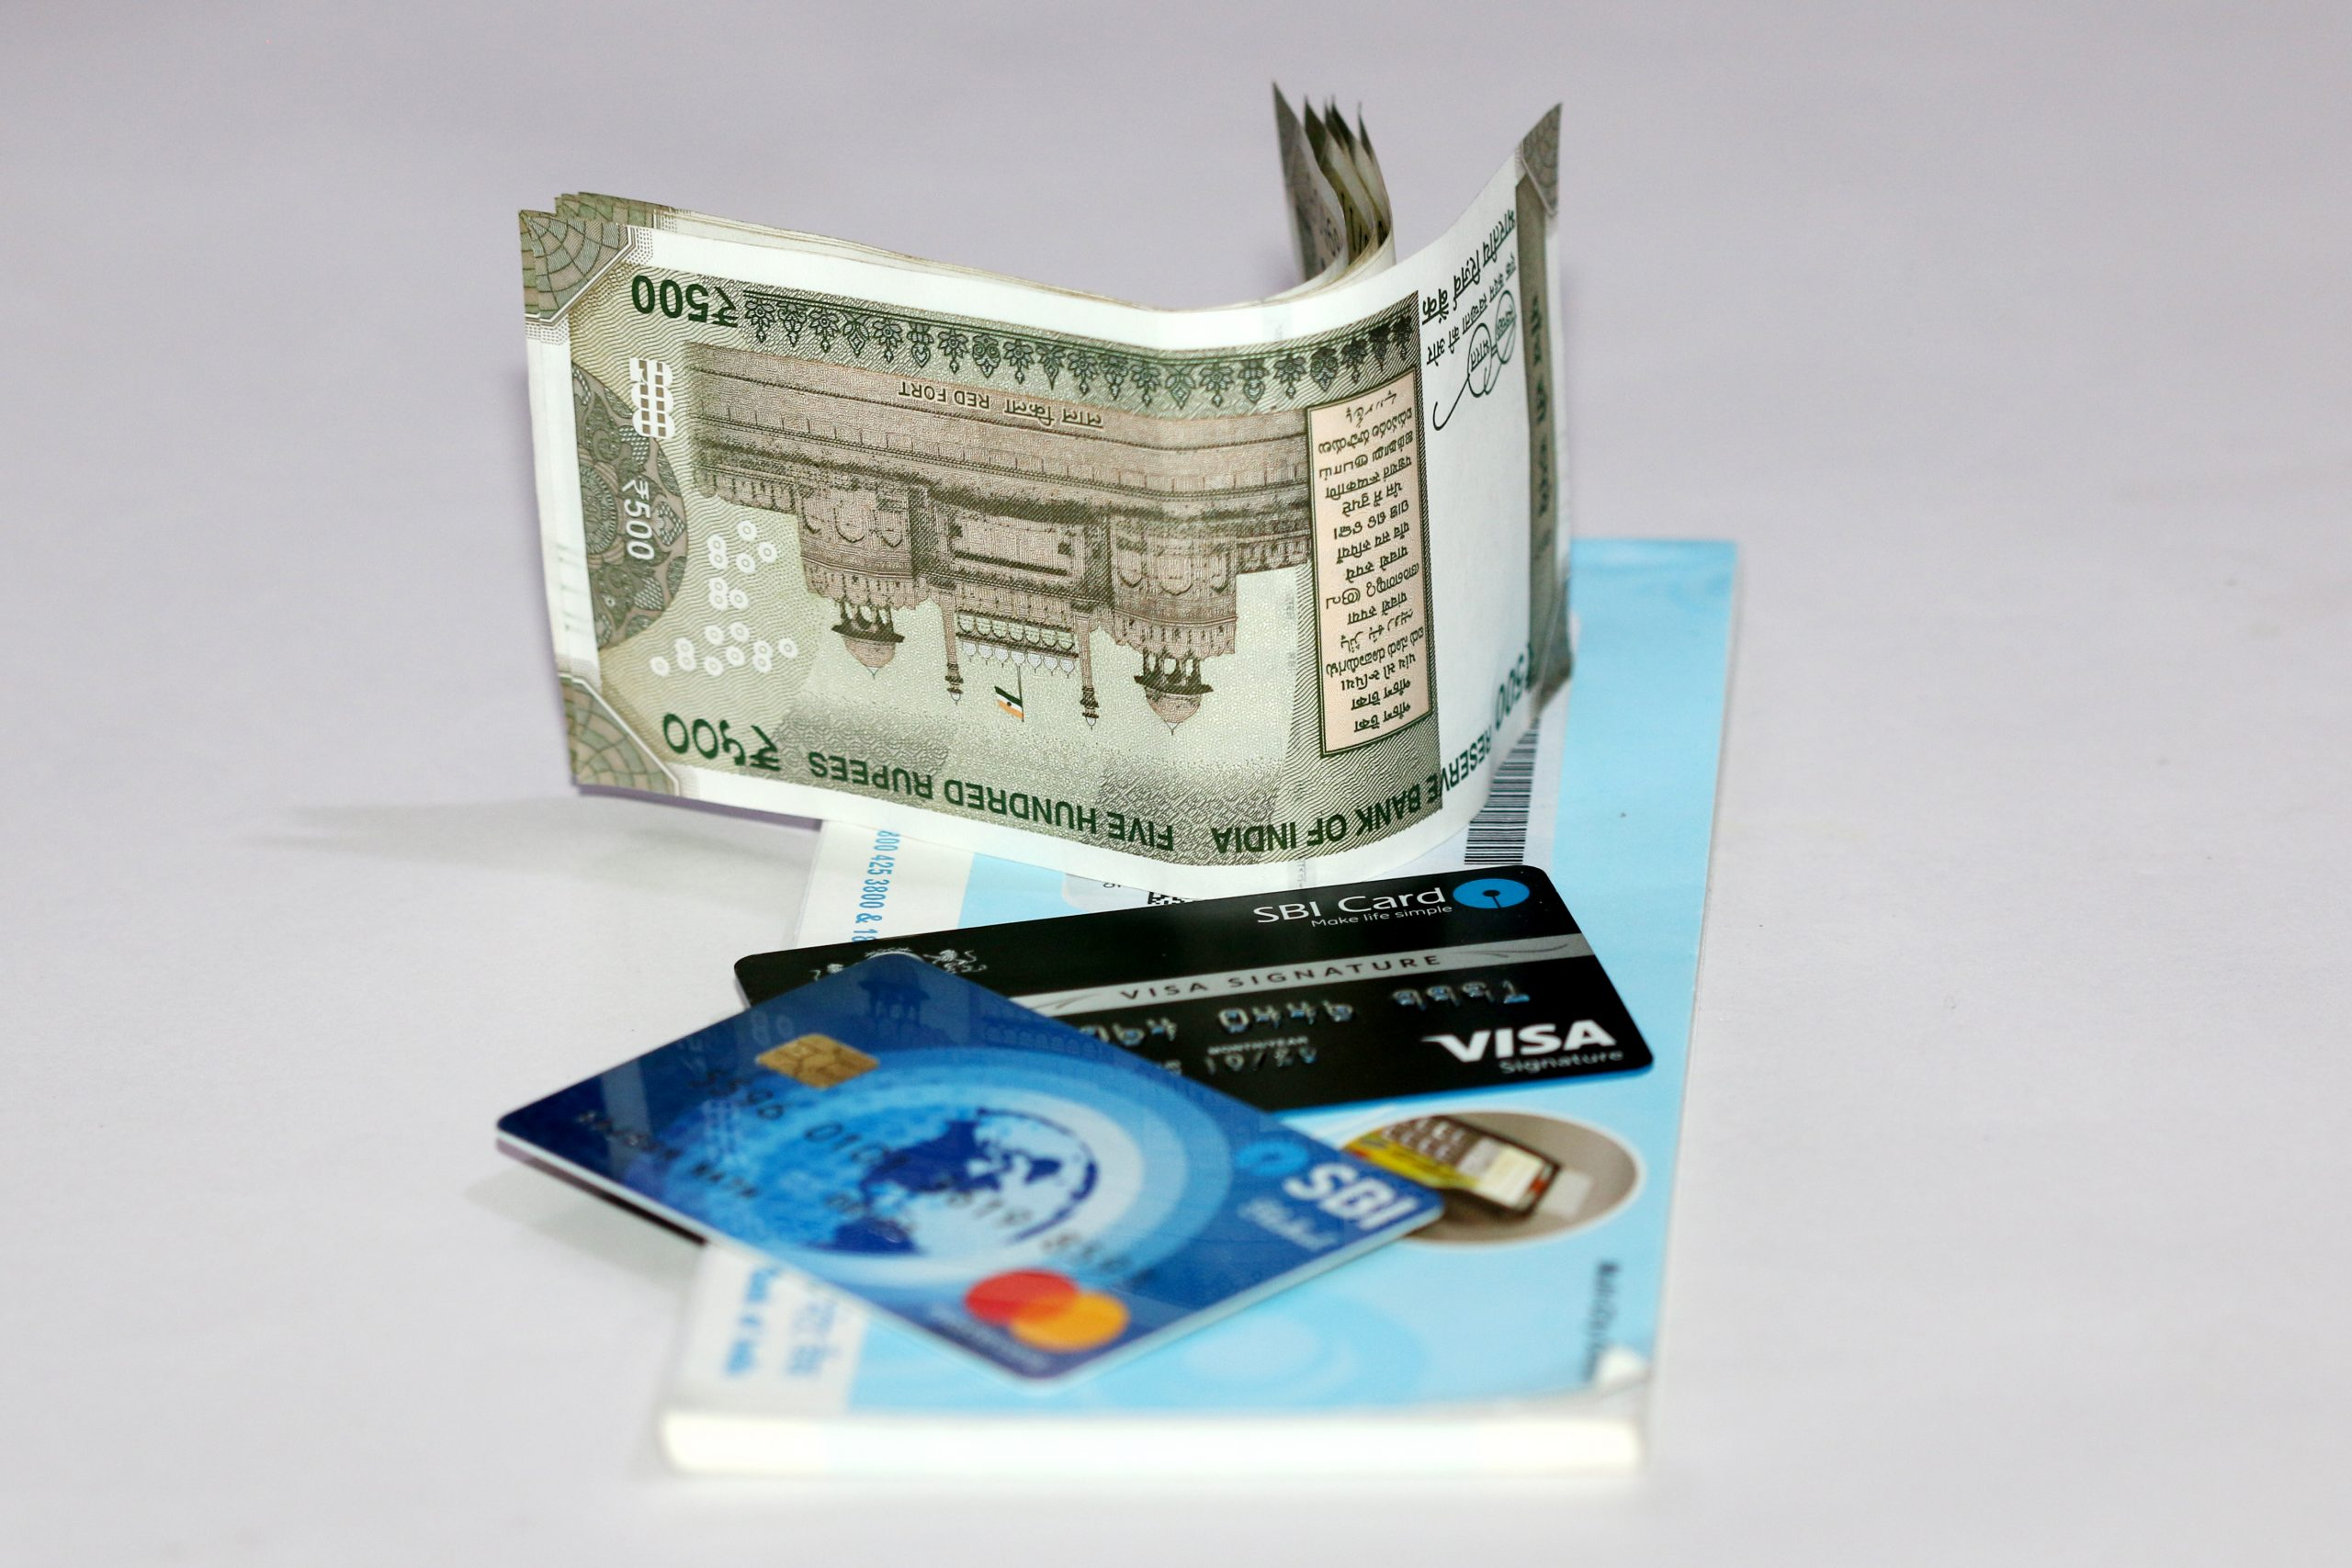 Money & Cards